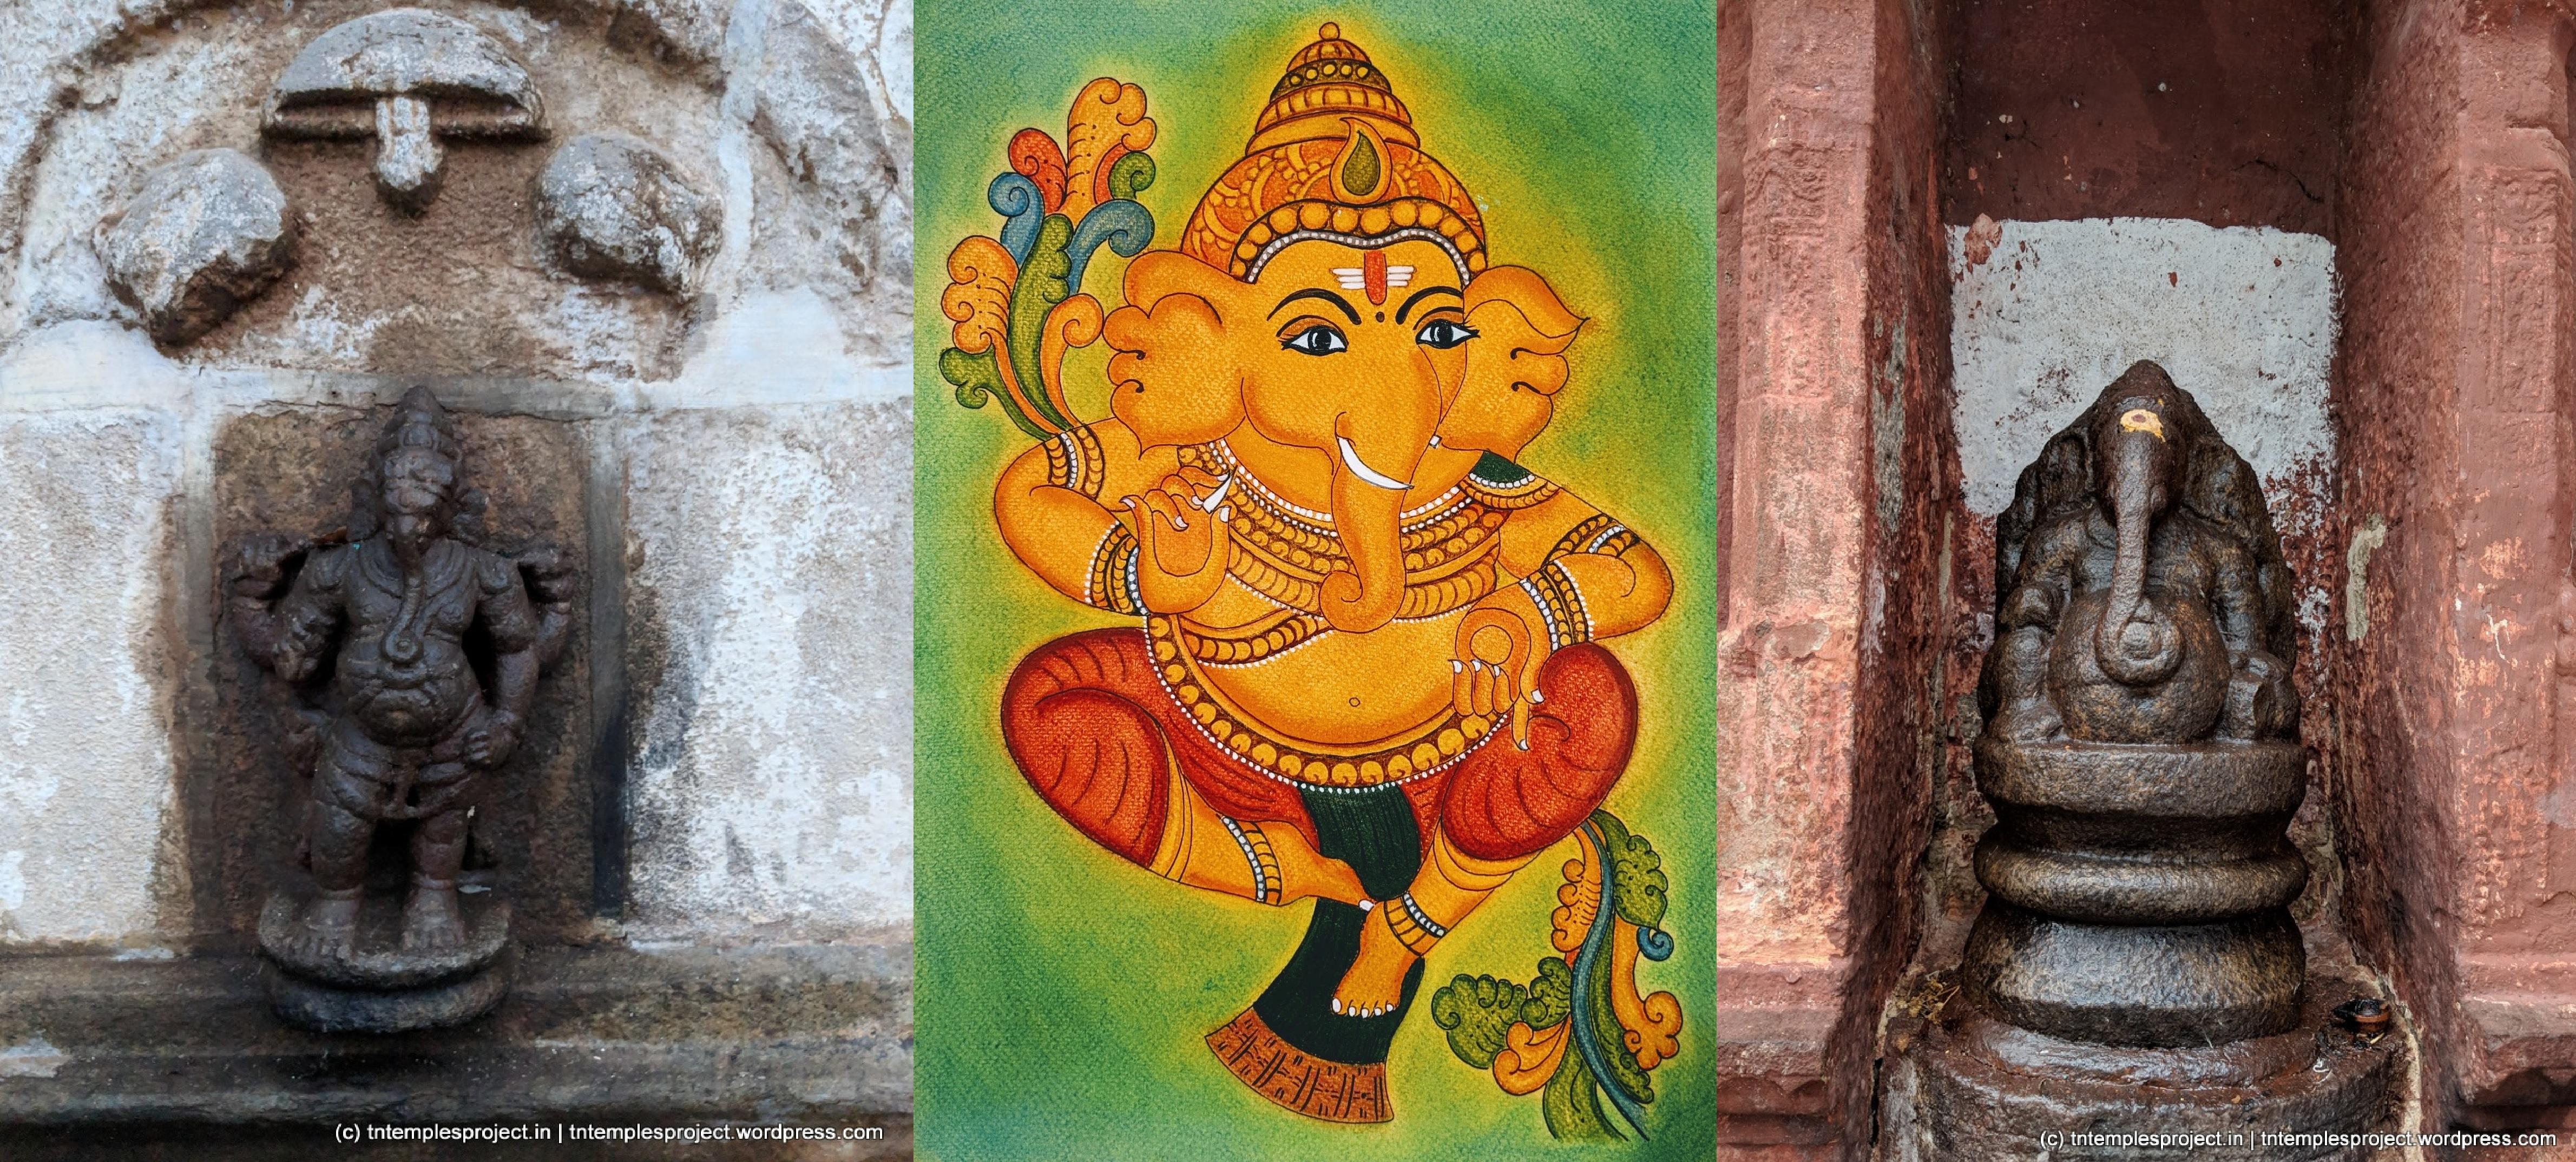 Sumukha – 25 thoughts on Vinayakar